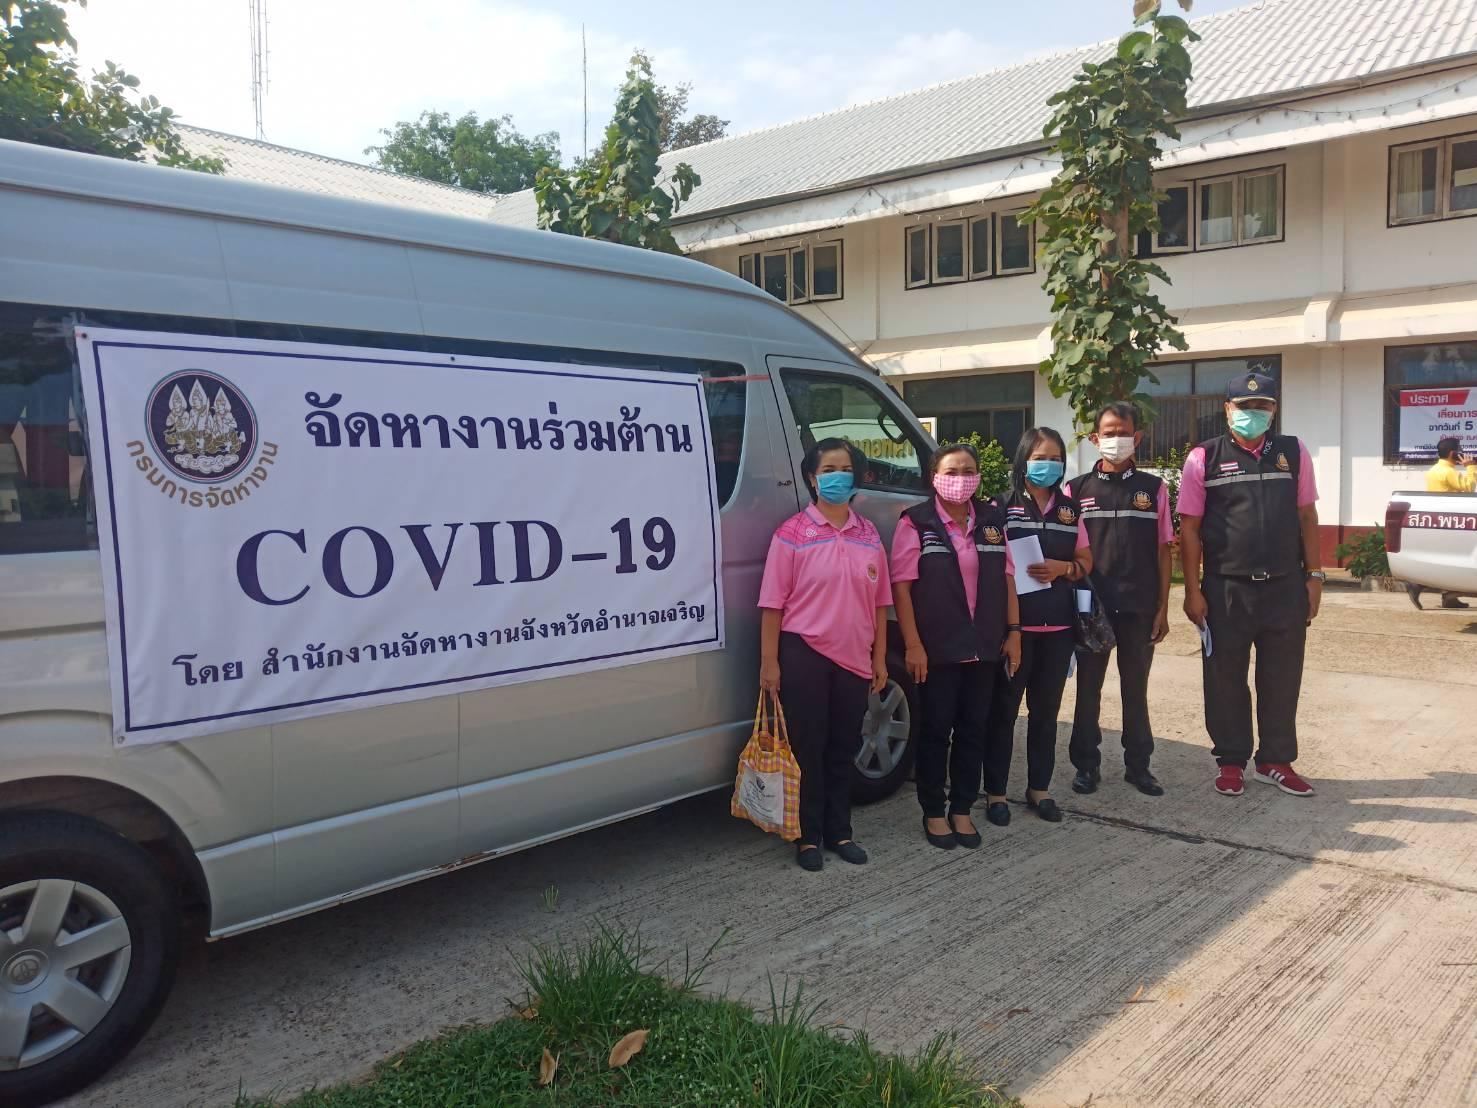 COVID-19 ชุดที่ 4 (14 เม.ย.2563)